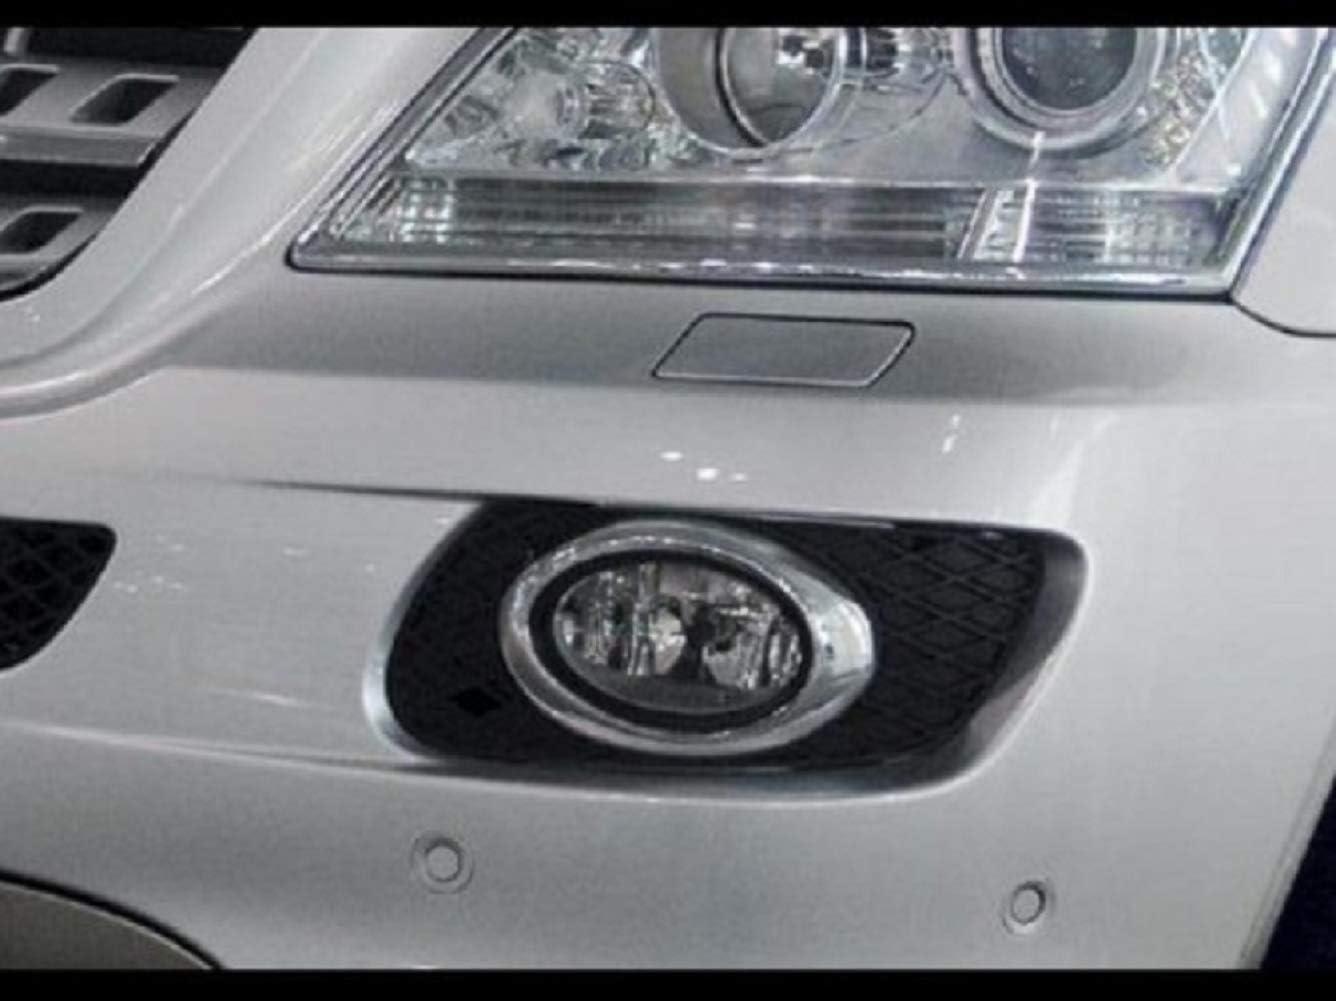 Haneex Chrome Front Fog Light Cover Trim Fog Light Cover Frame Set for Mercedes Benz W164 ML Class 05-08 Oval Type